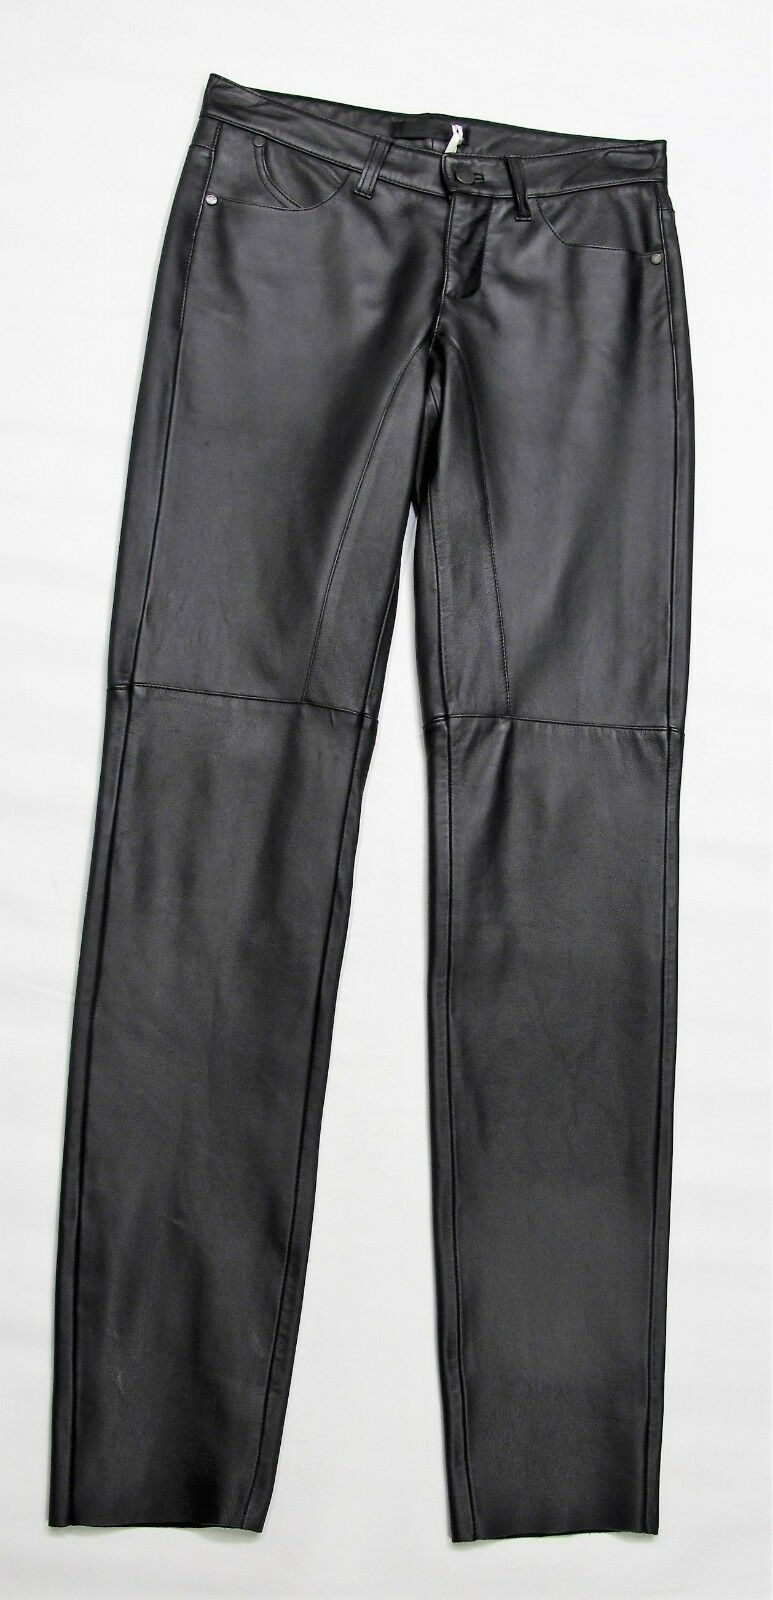 Mac Lederhose schwarz  Art.0265 Gr. 40 32